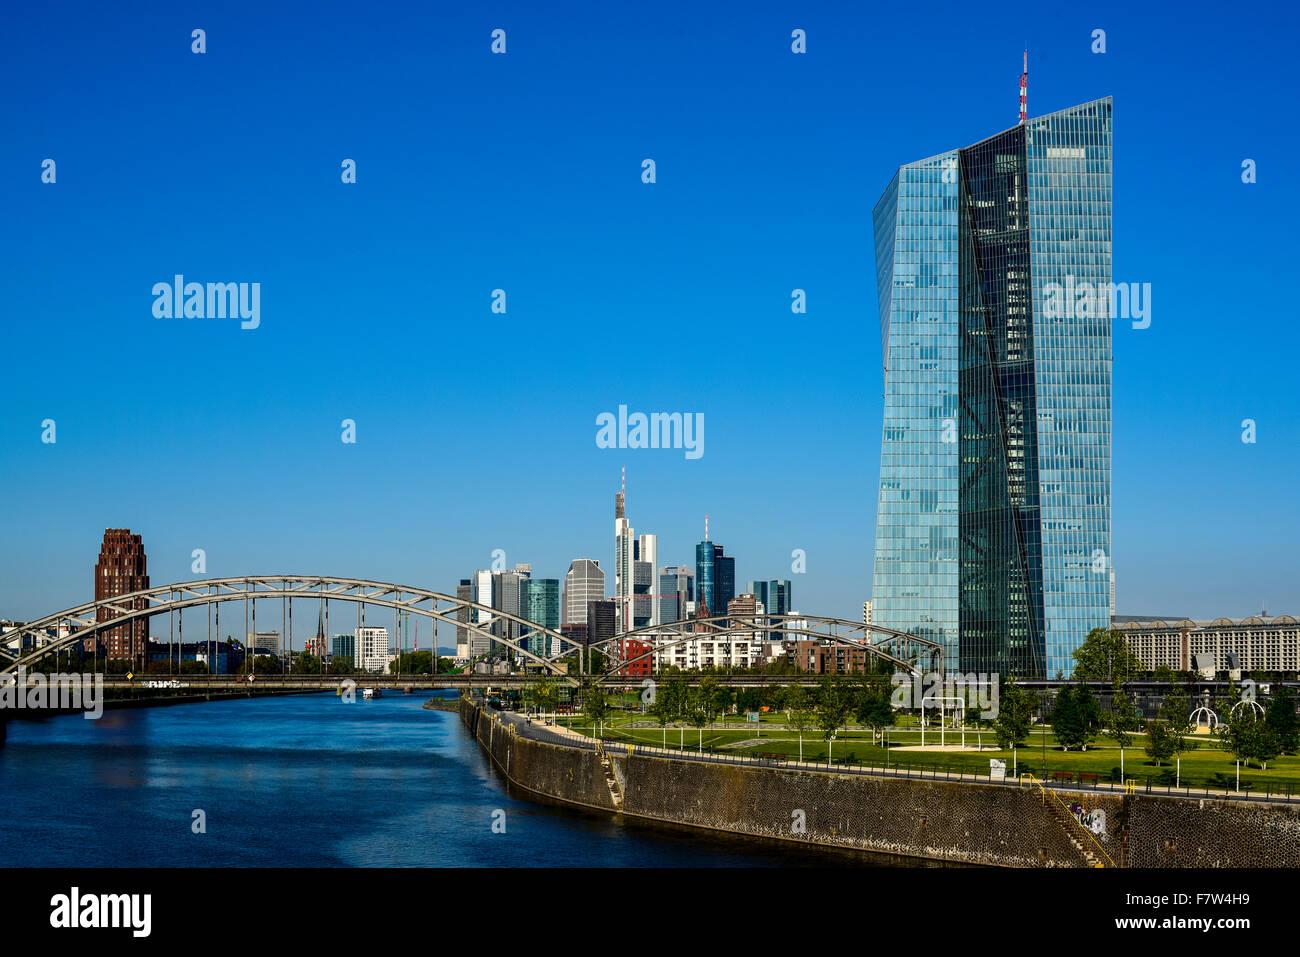 ECB, European Central Bank, Frankfurt, Germany - Stock Image